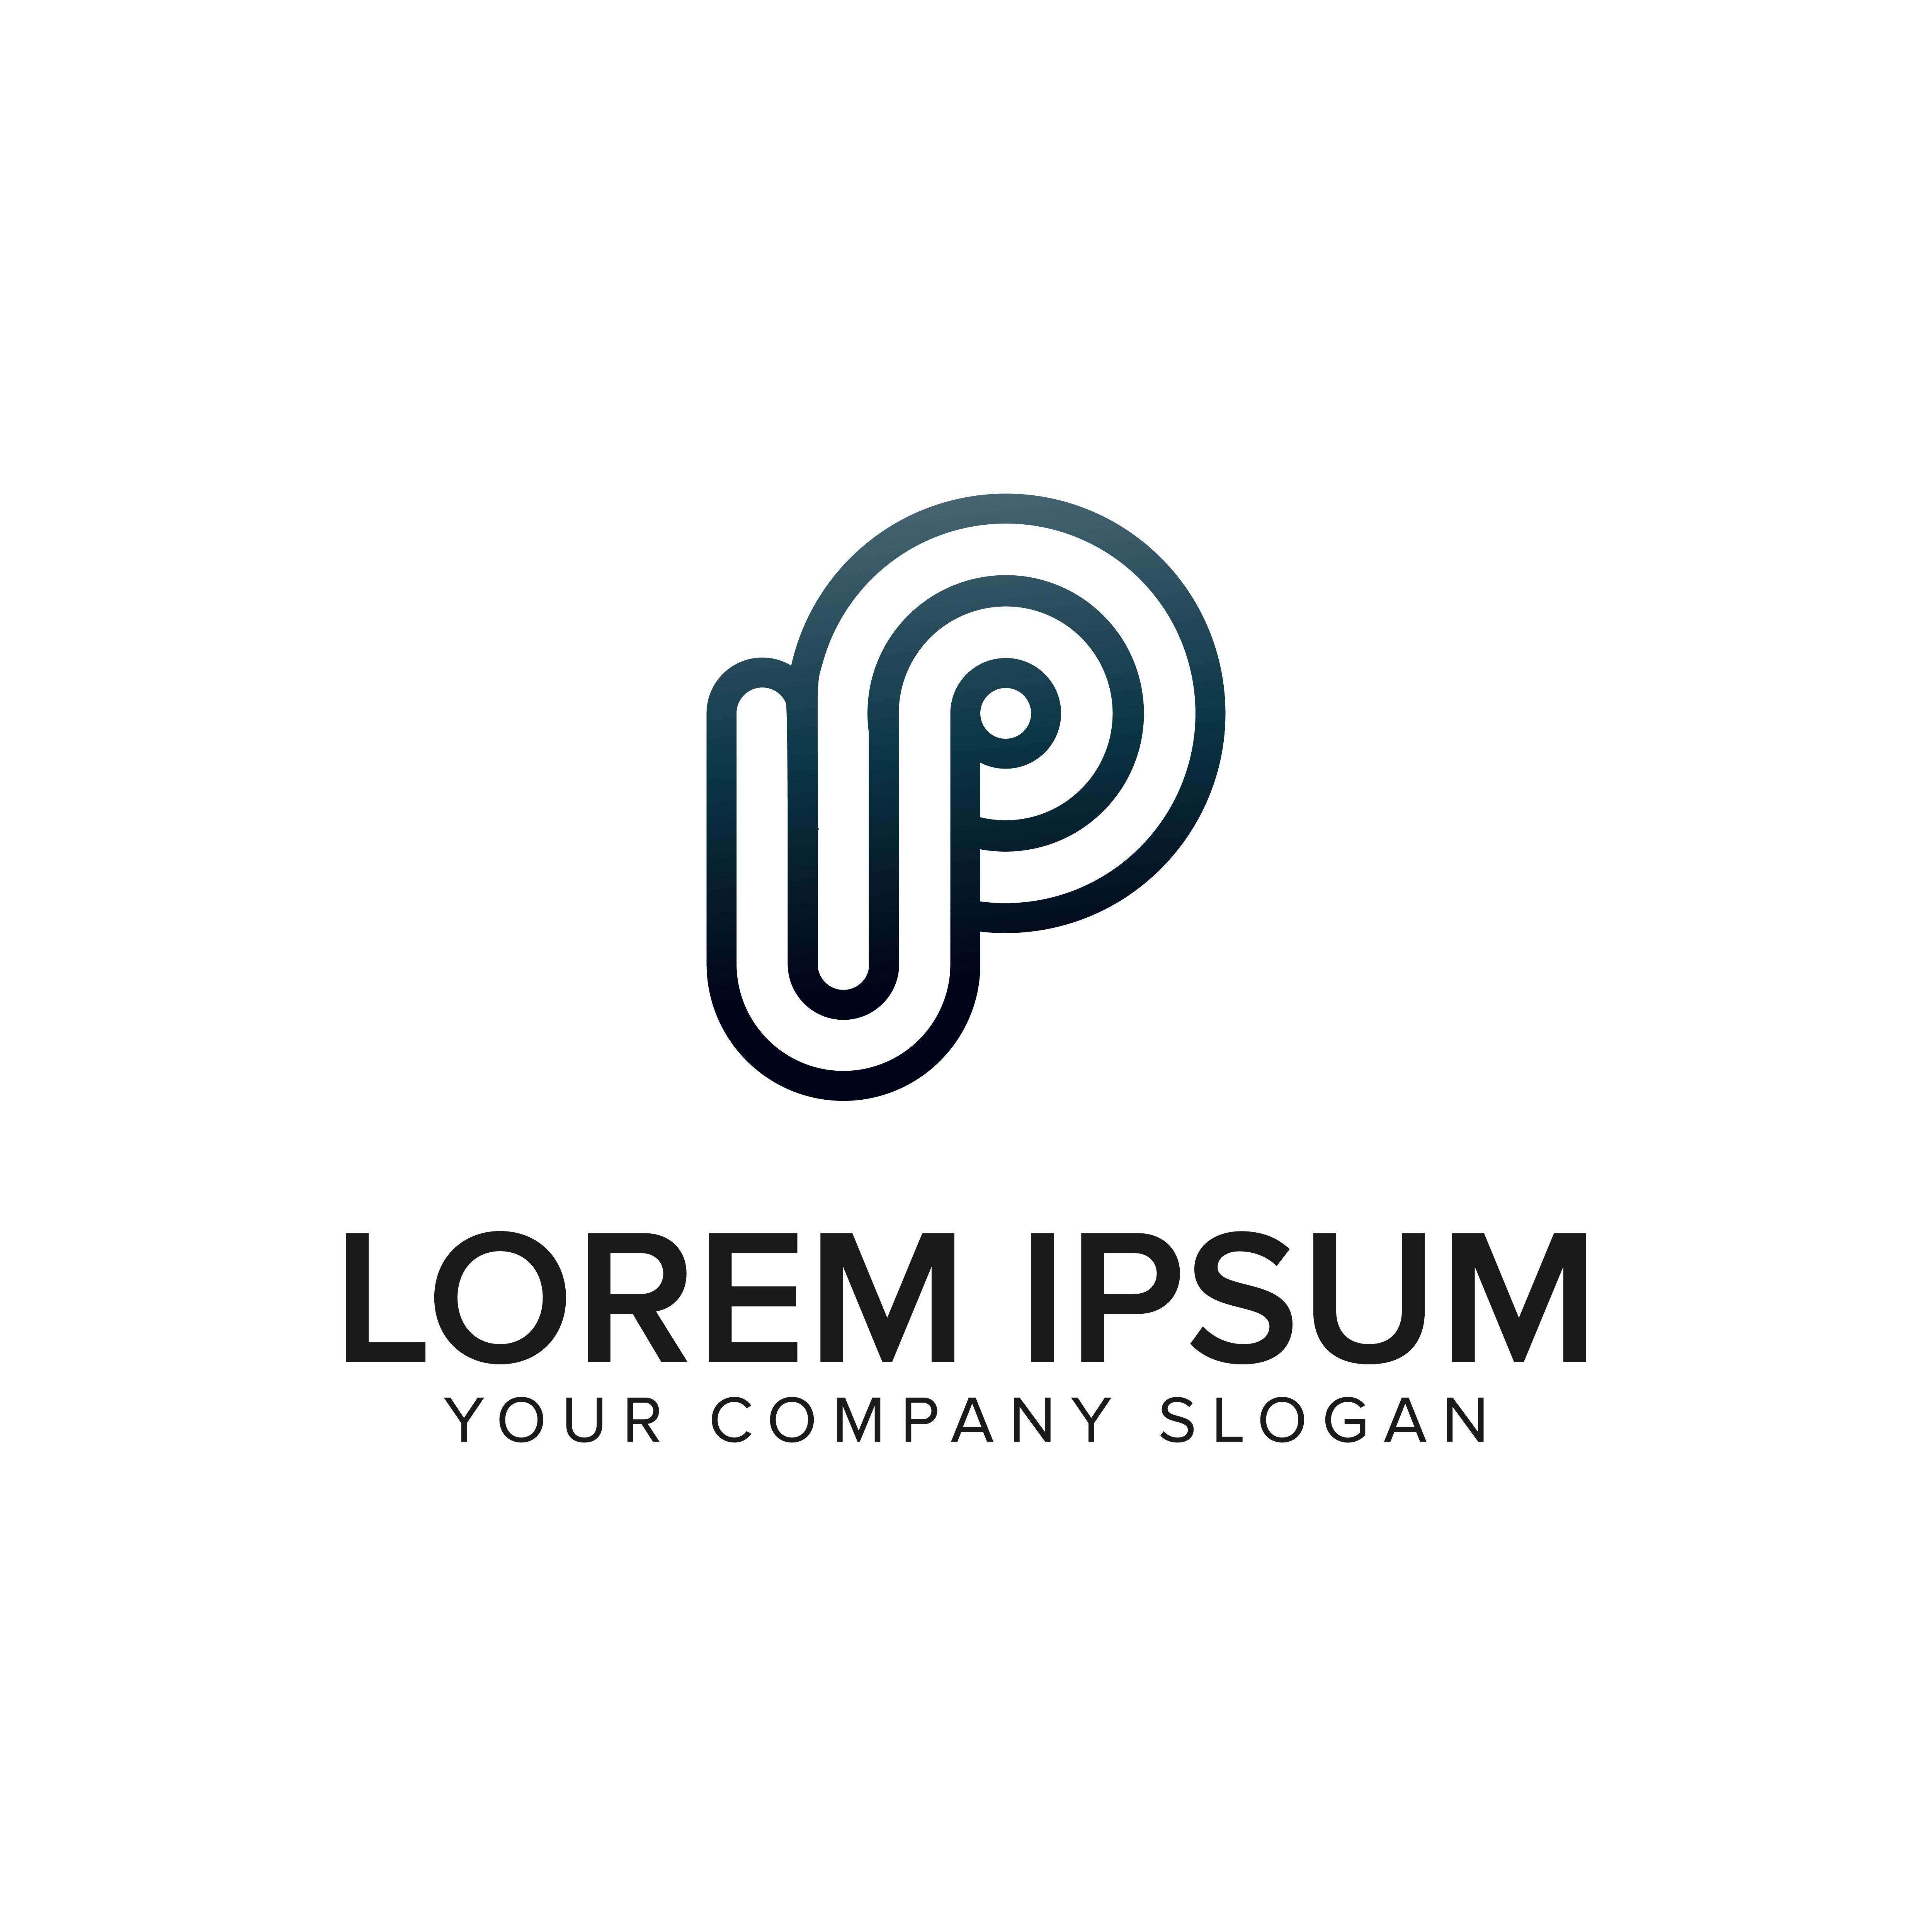 Modern Letter K Logo Concept: Simple Letter P Logo Design Concept Template